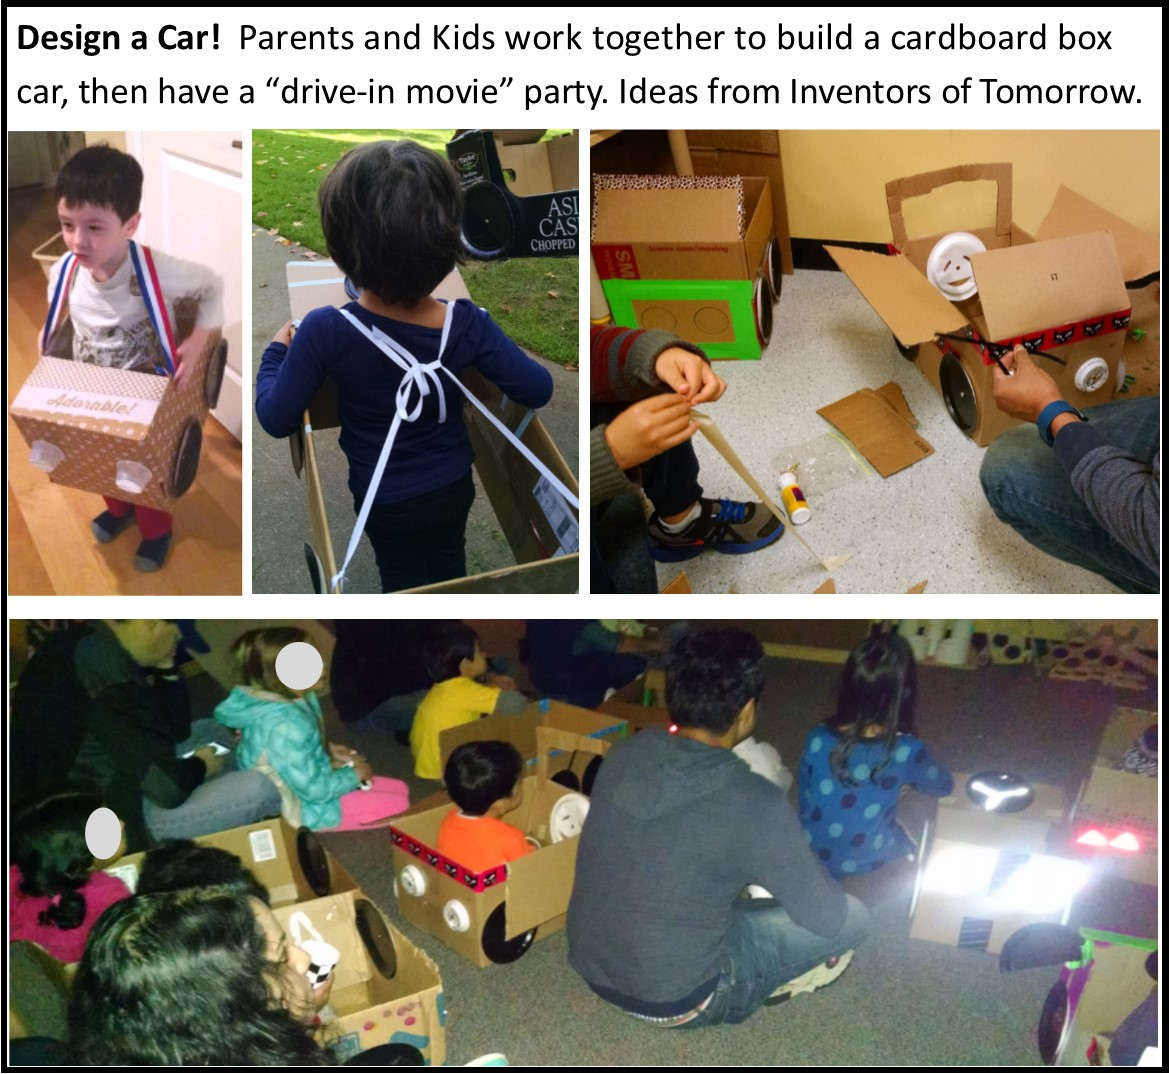 design-a-cardboard-box-car